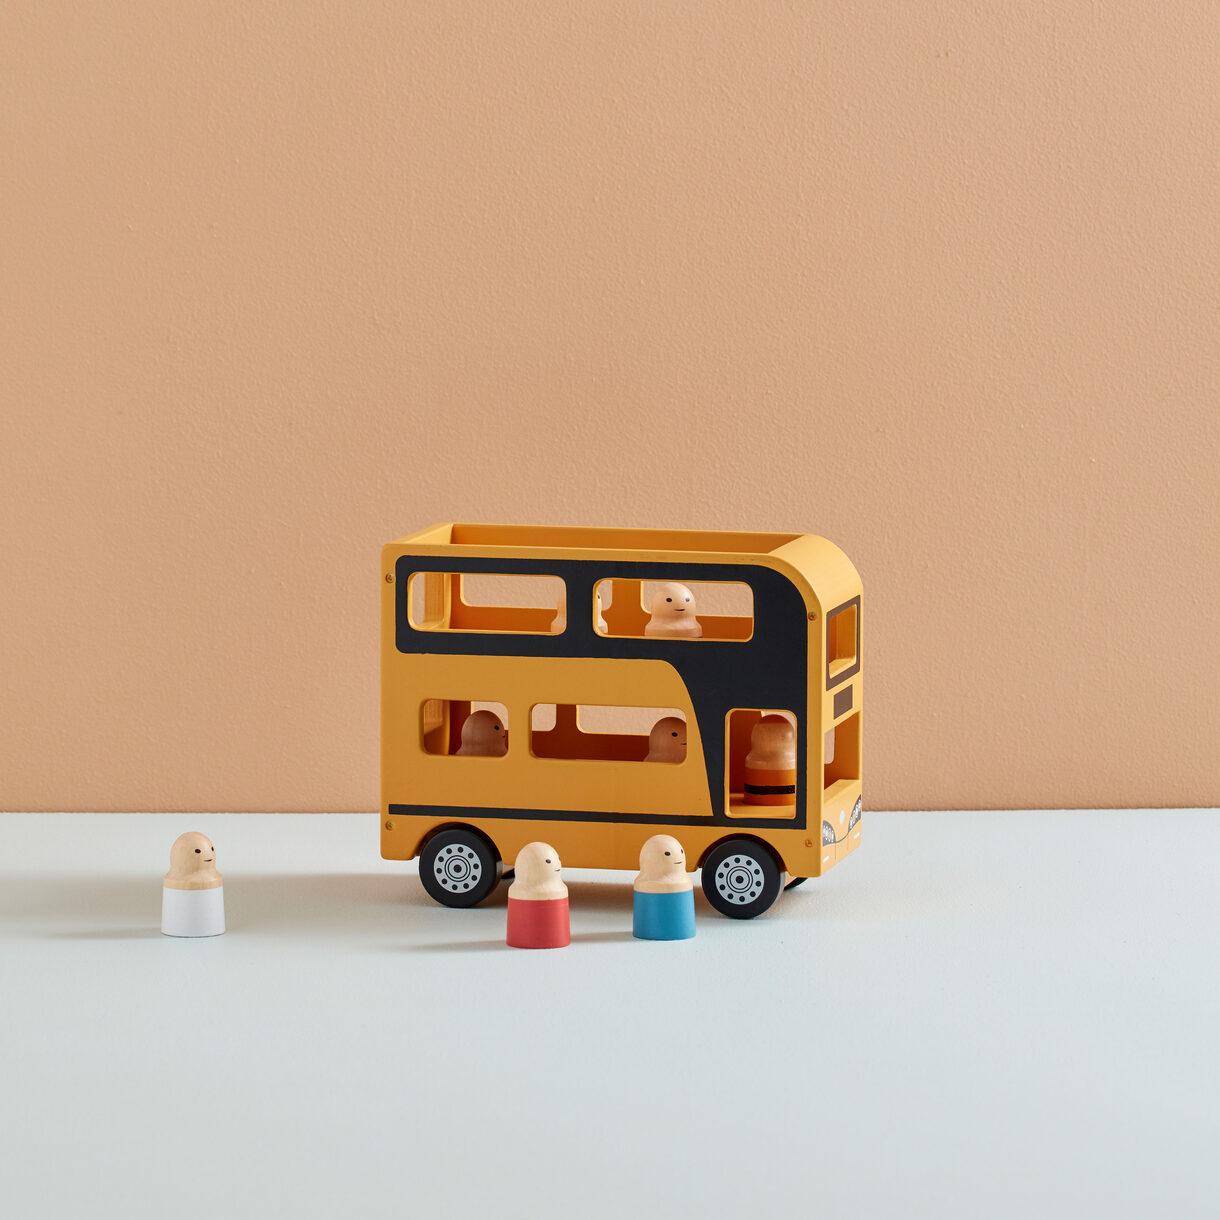 kids concept //木製おもちゃの二階建てバスセット